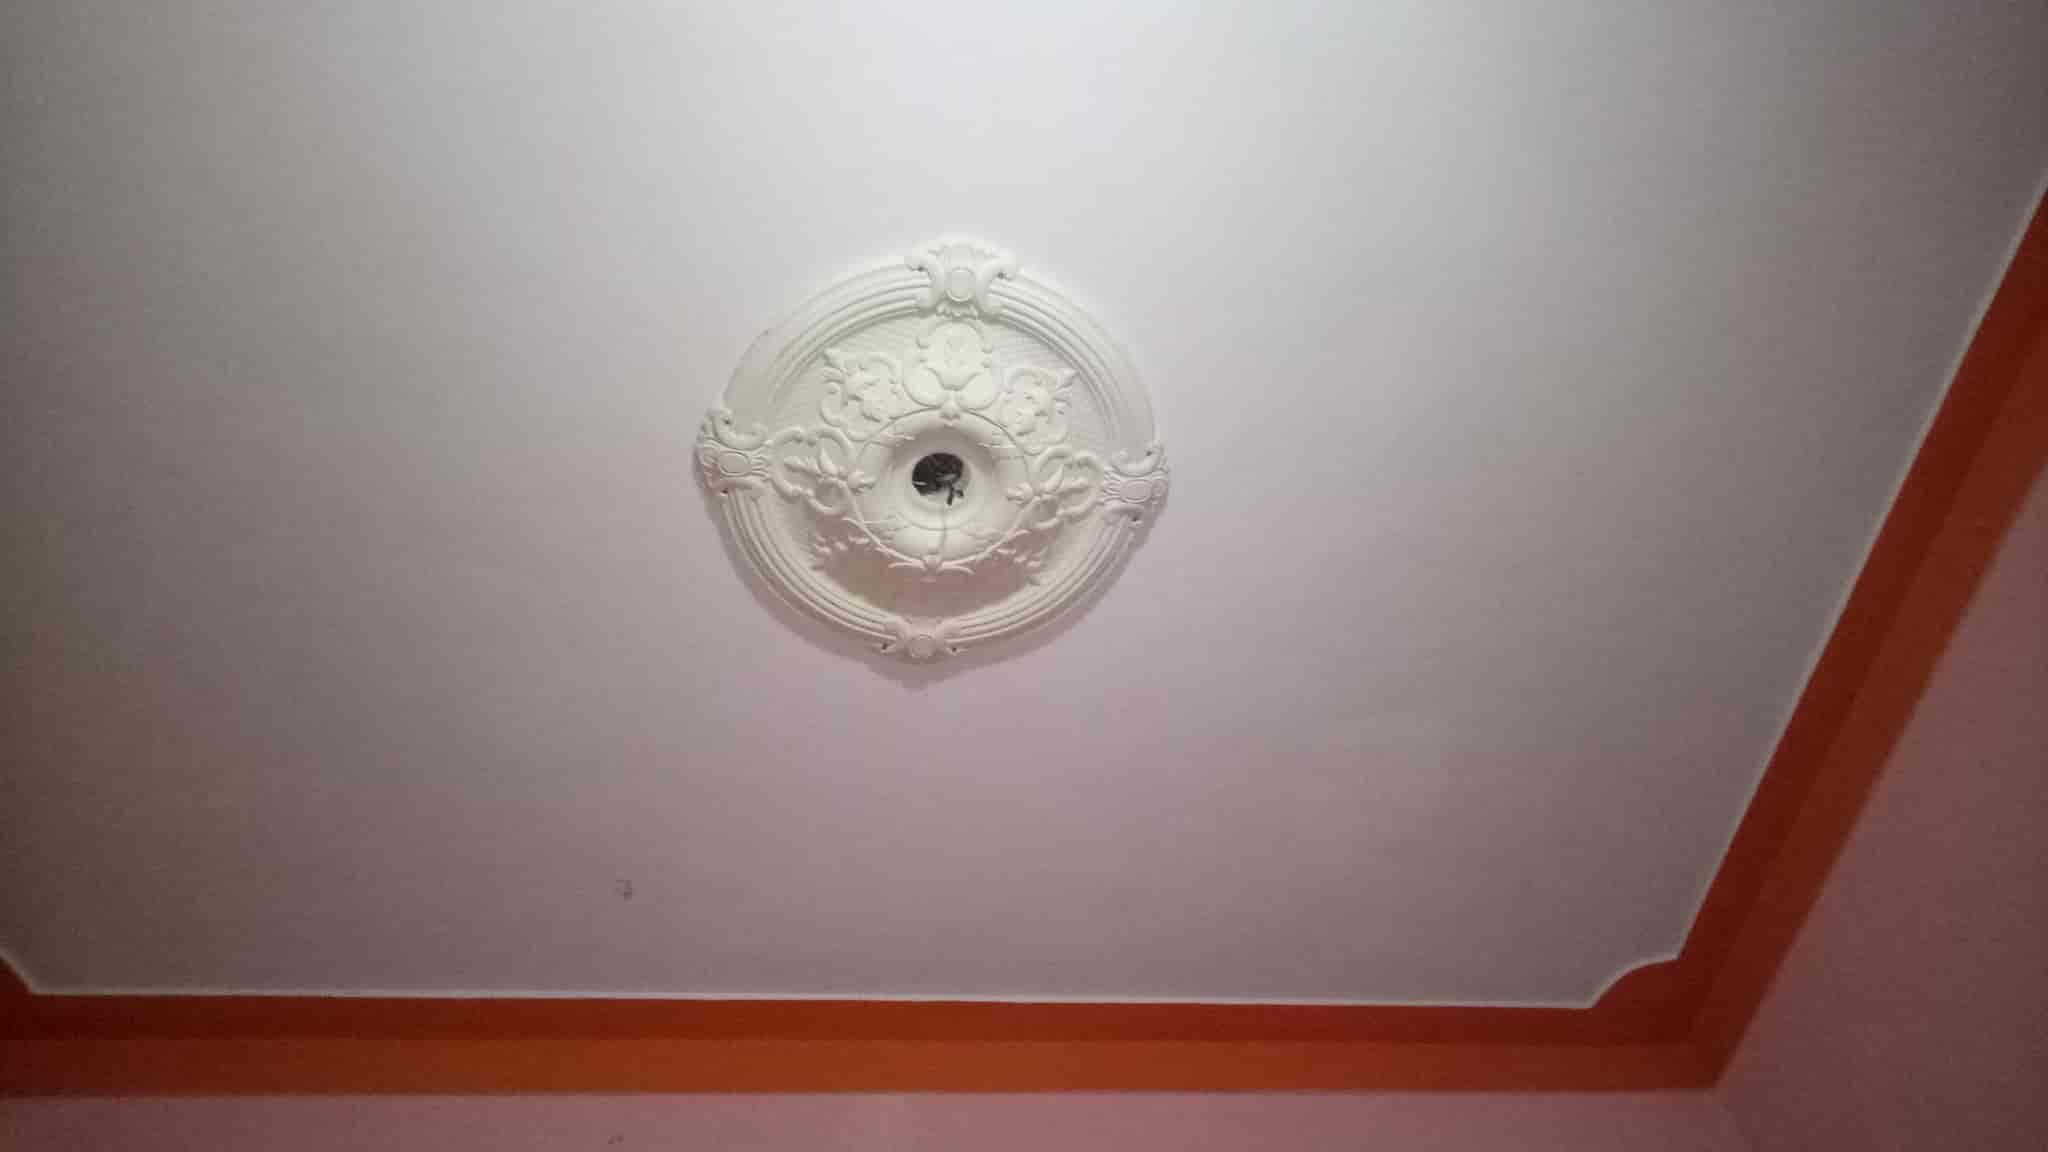 Stupendous S H Pop False Ceiling Contractor Photos Kengeri Bangalore Interior Design Ideas Truasarkarijobsexamcom